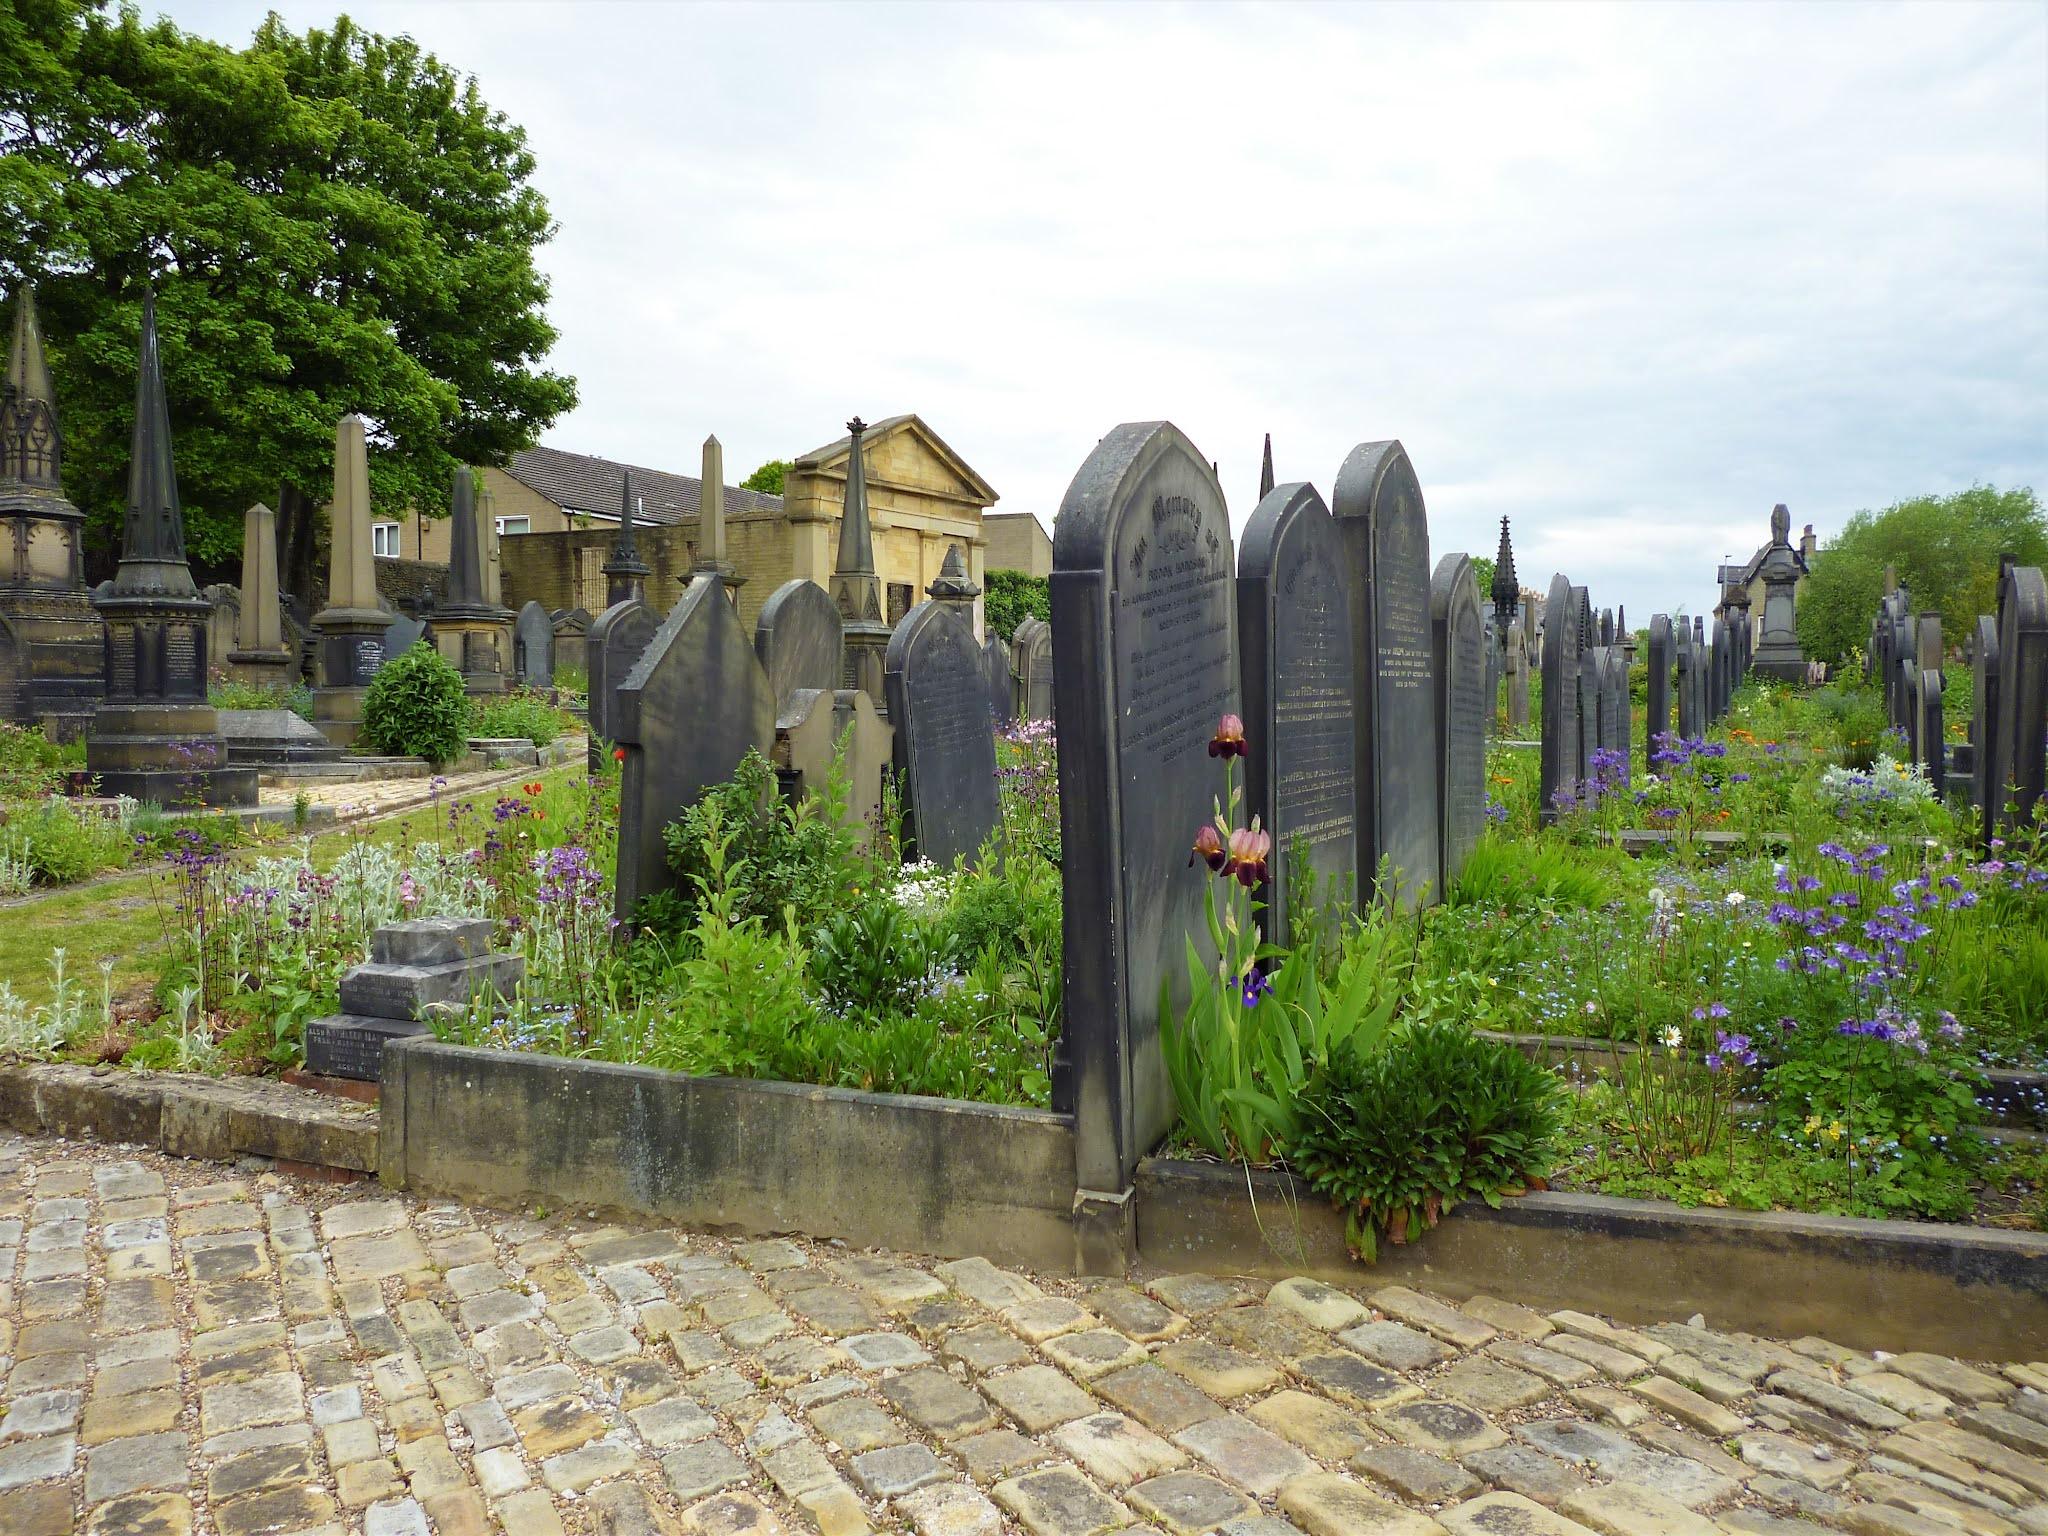 Lister Lane Cemetery (Halifax, United Kingdom)